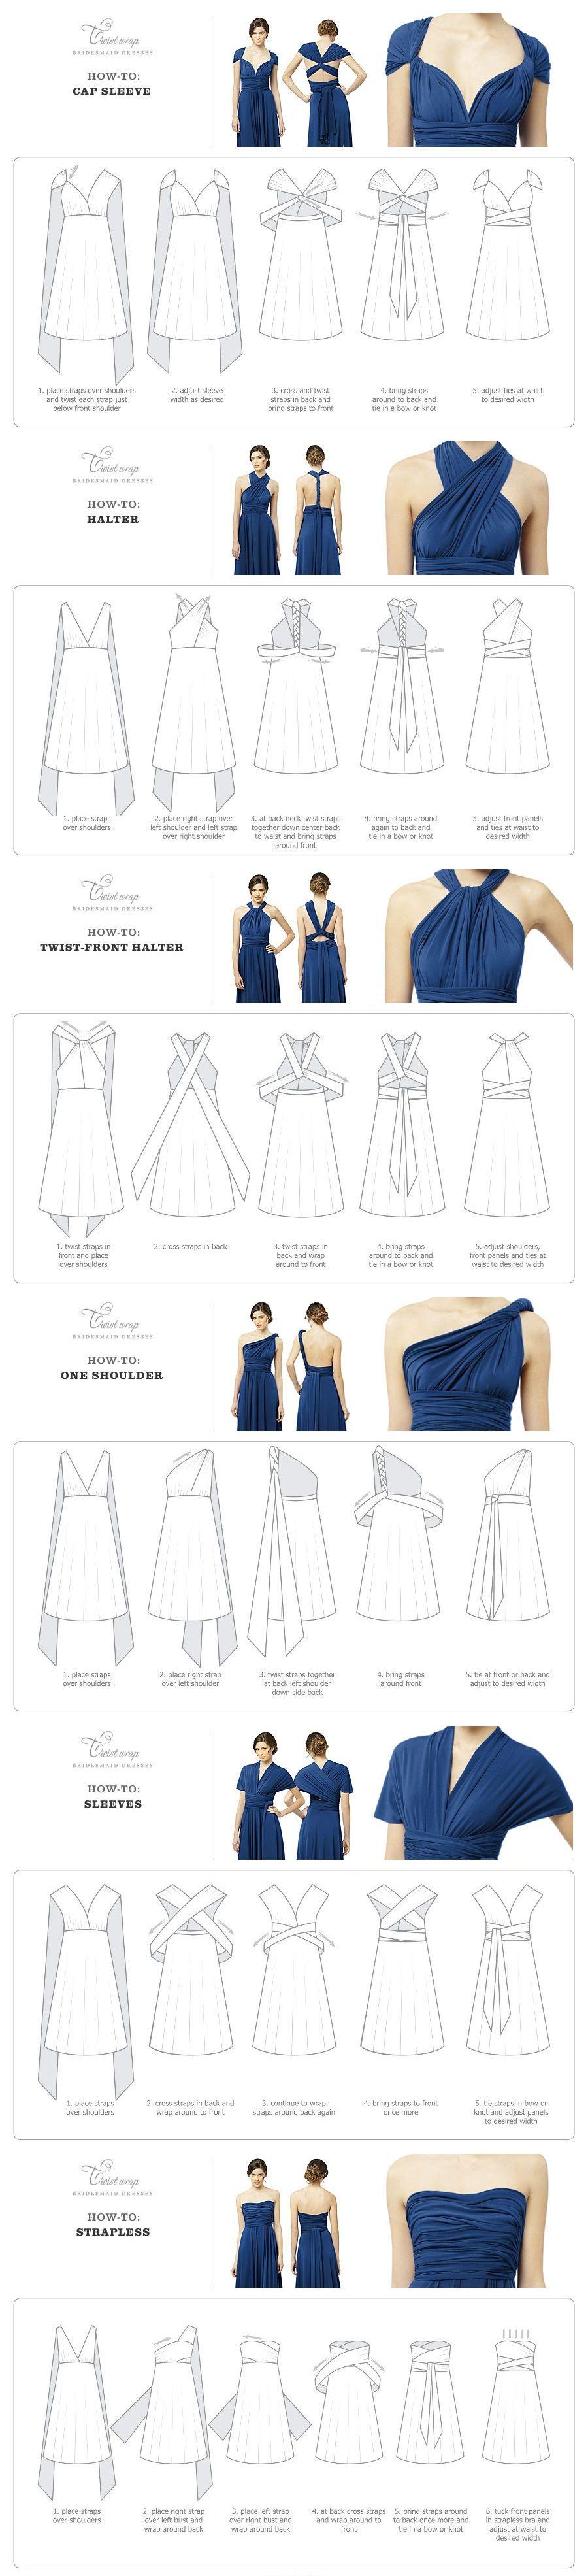 Sequin bridesmaid dress short sleeve bridesmaid dresses gold